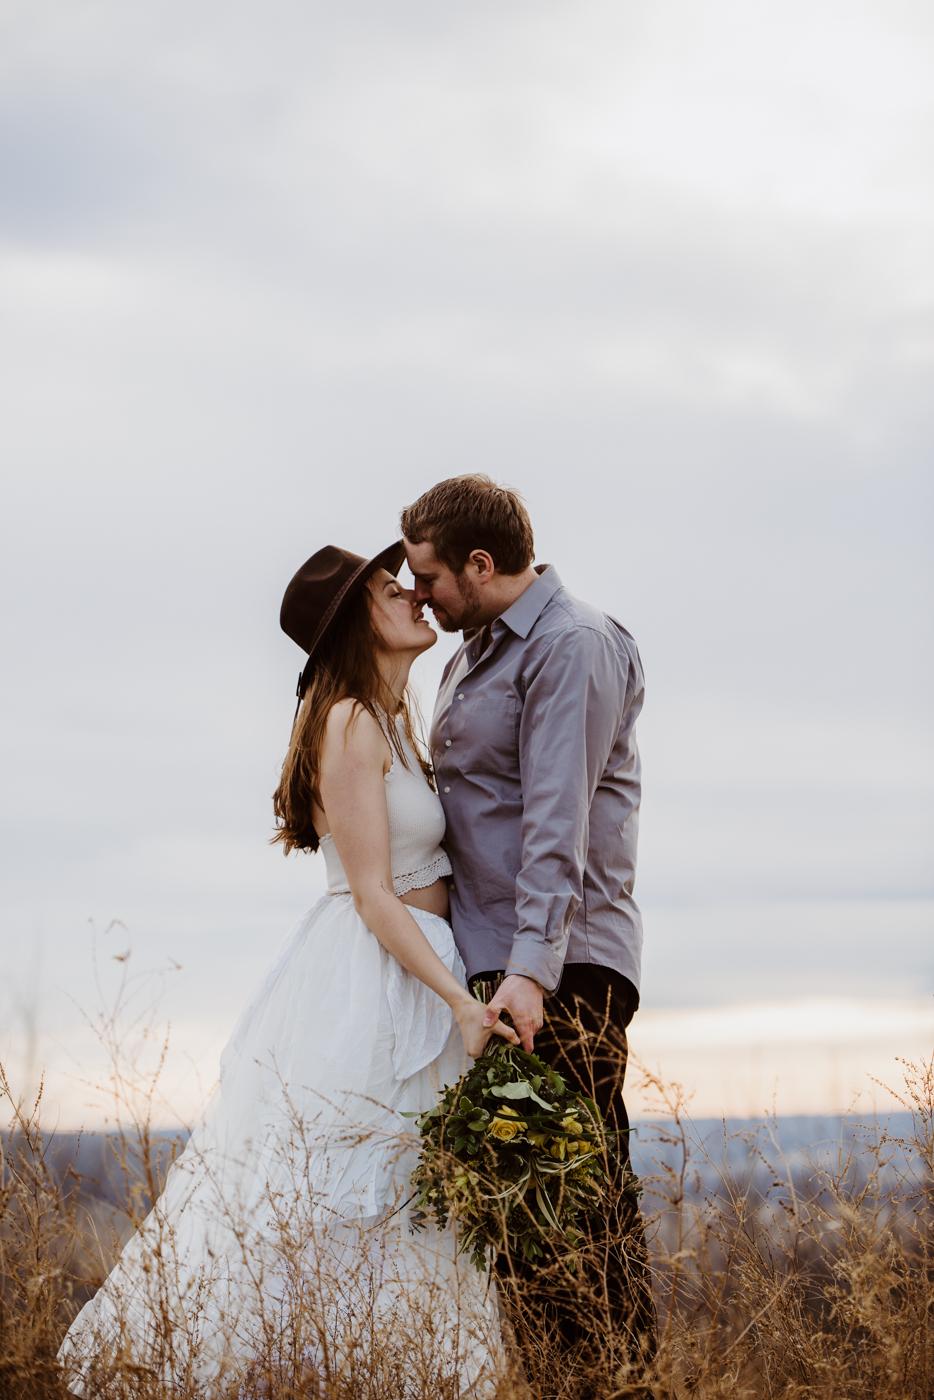 FortSt.John_photographer_TyraEPhotography_Wedding_Couple_Family_Photograhy_DawsonCreek_Elopement_Bride_Boduoir_Portraits-40.jpg